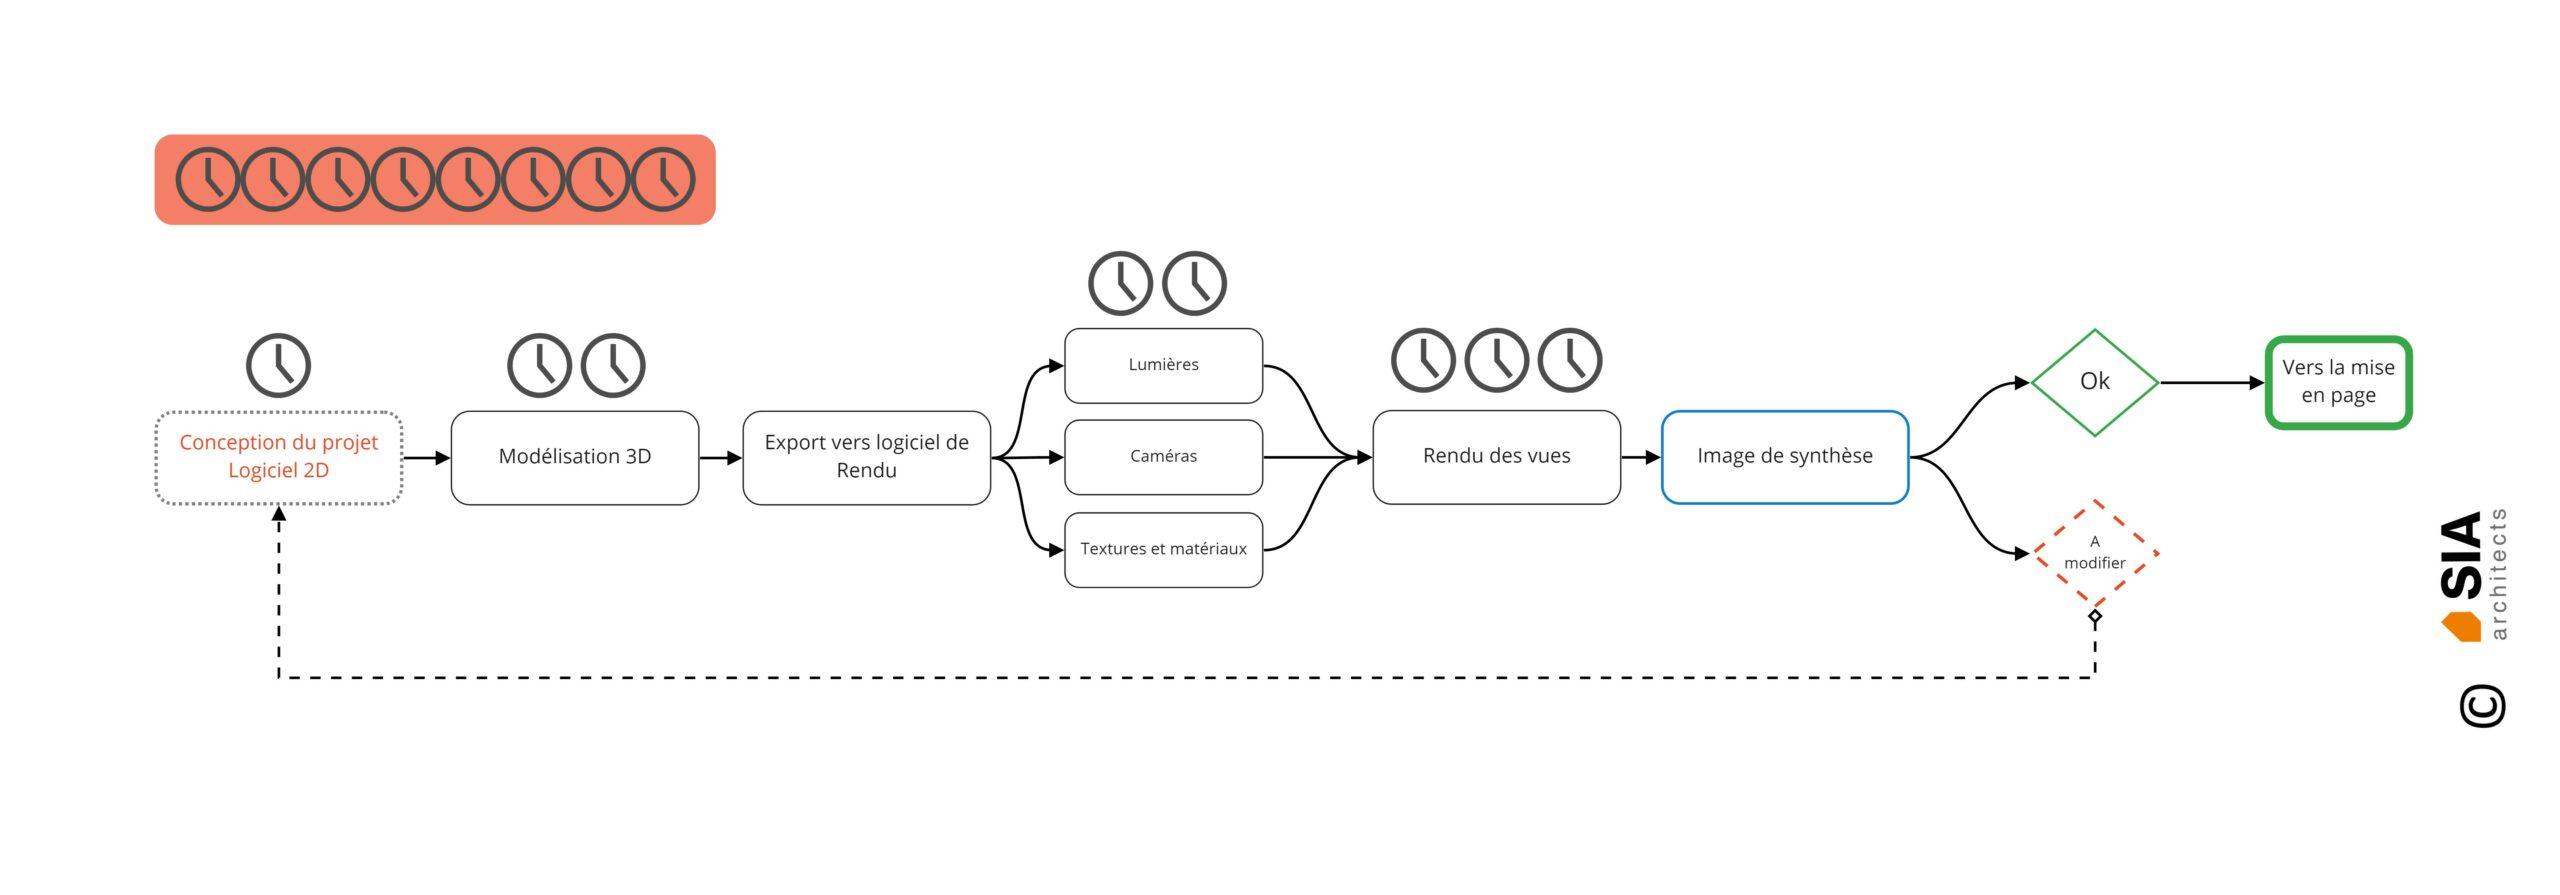 Conception architecturale - Architecture 3D - Process classique - SIA.architects